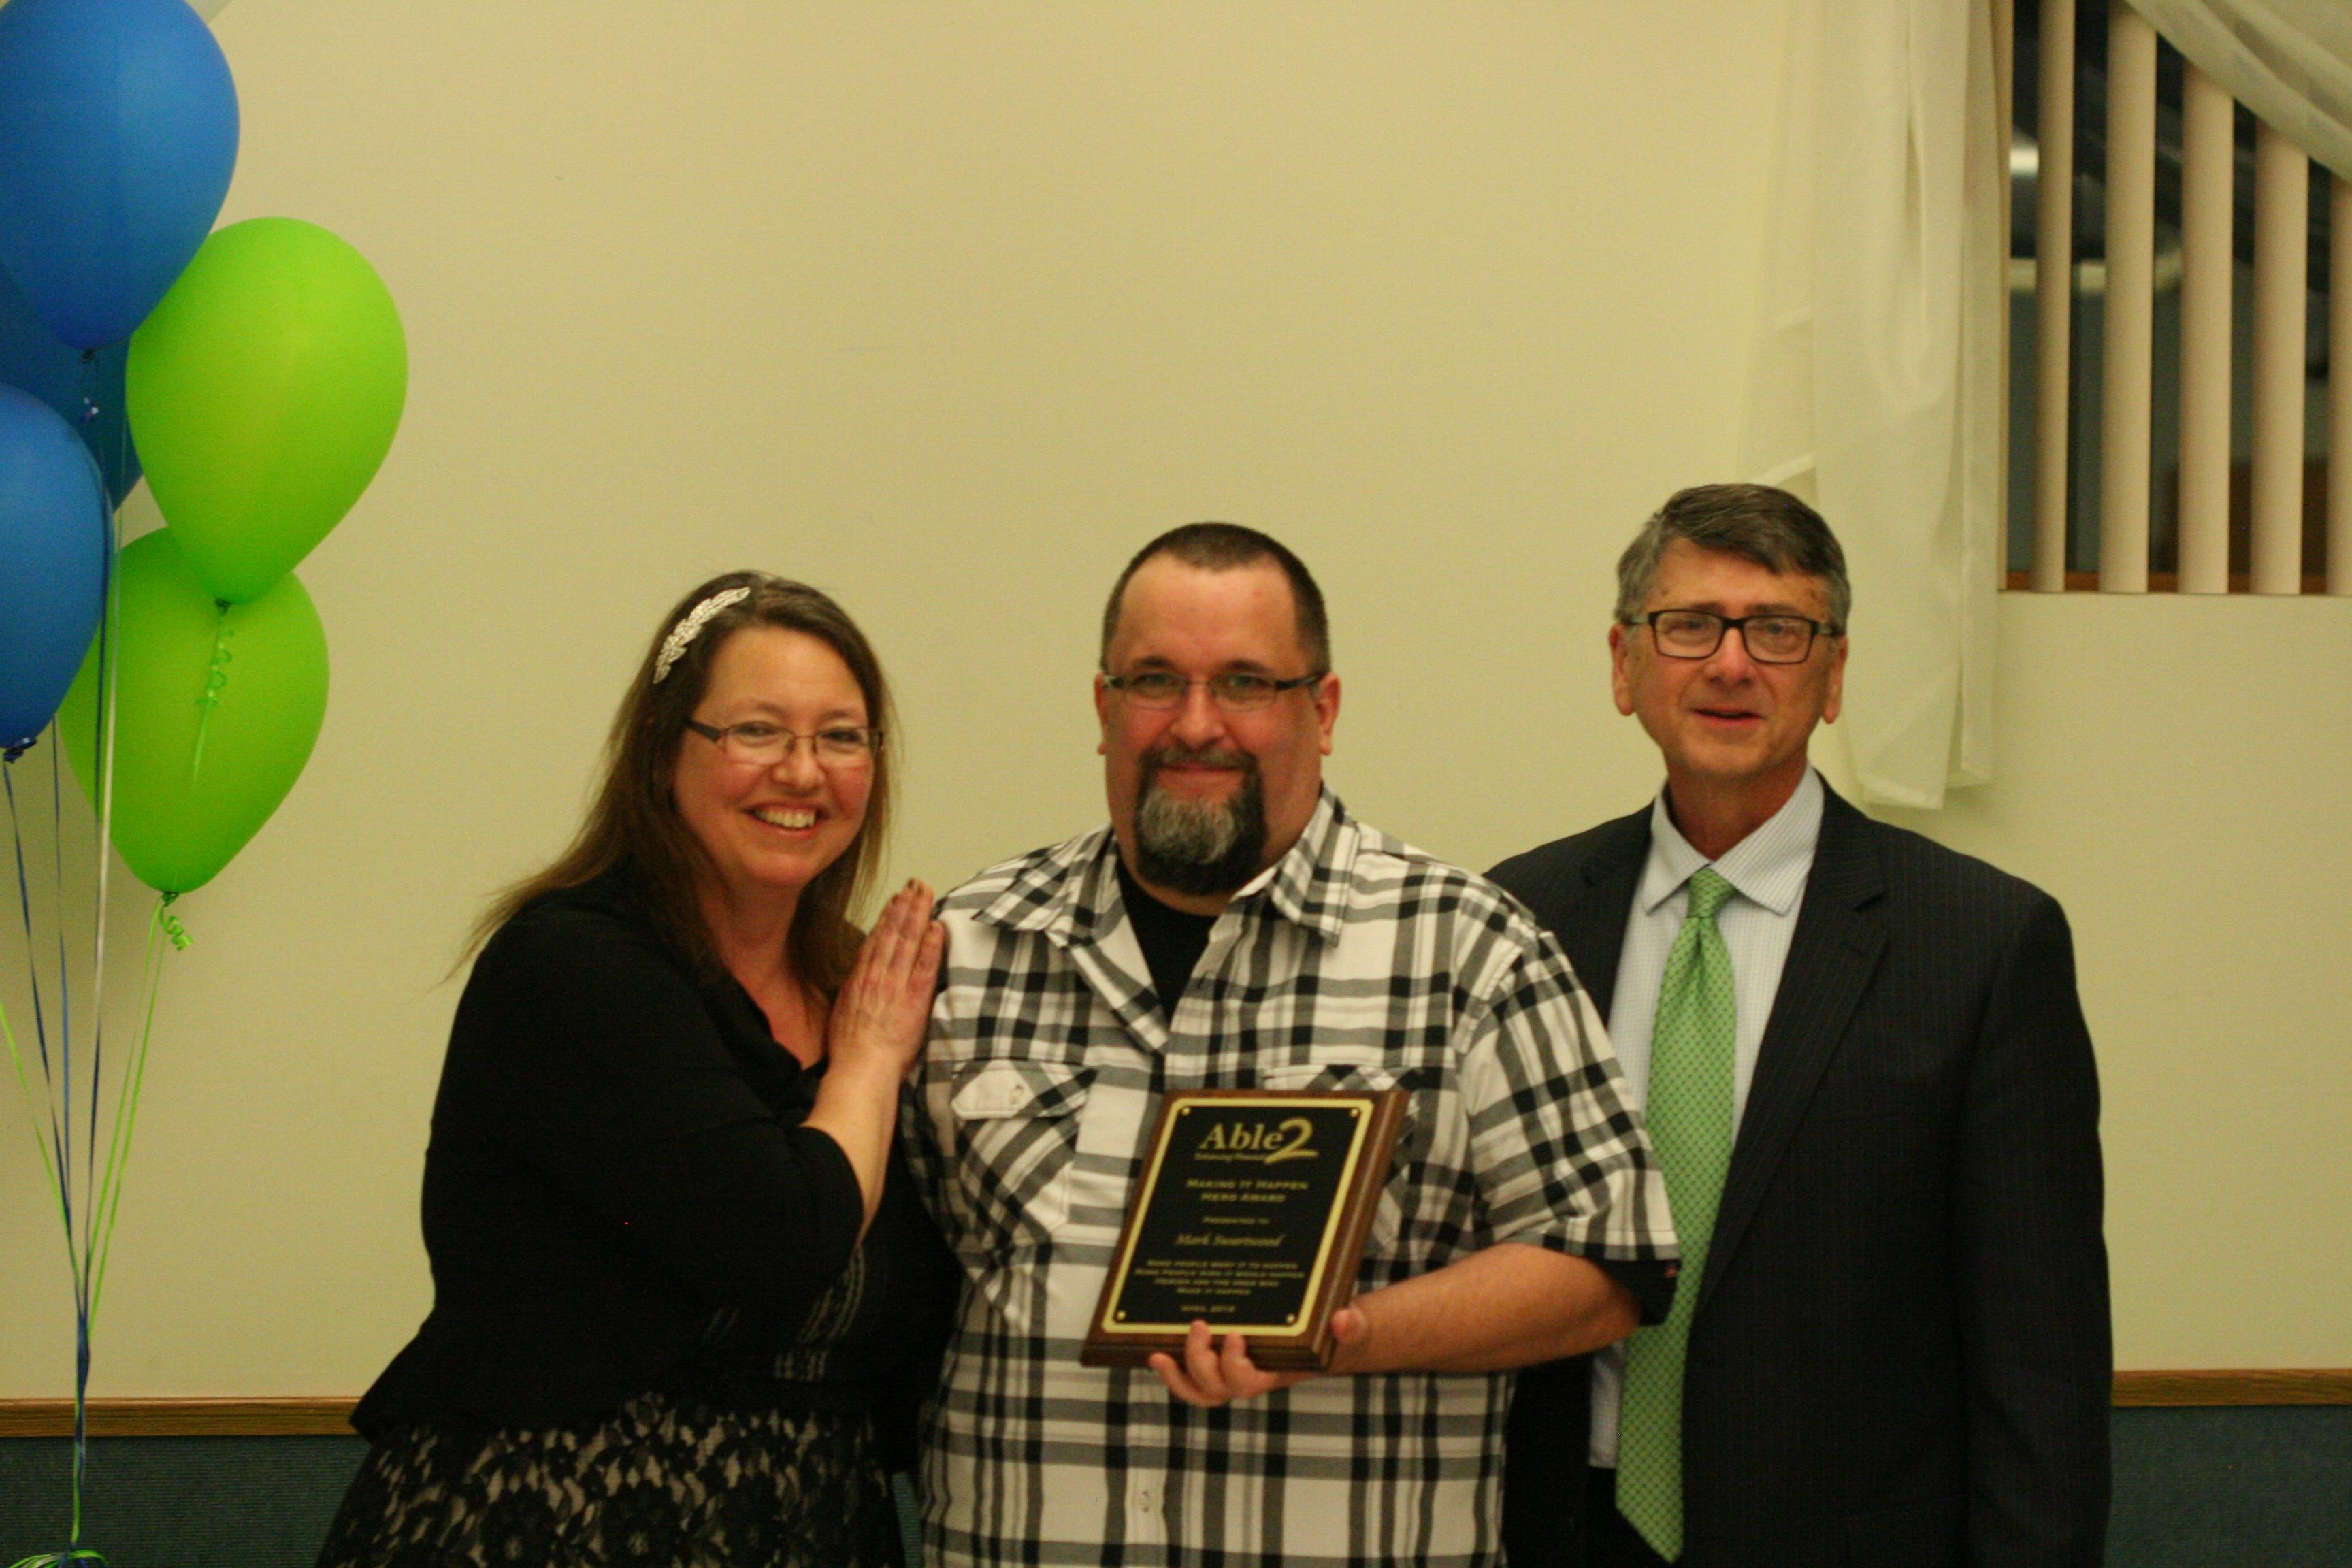 Mark Swartwood, Making It Happen Award Recipient